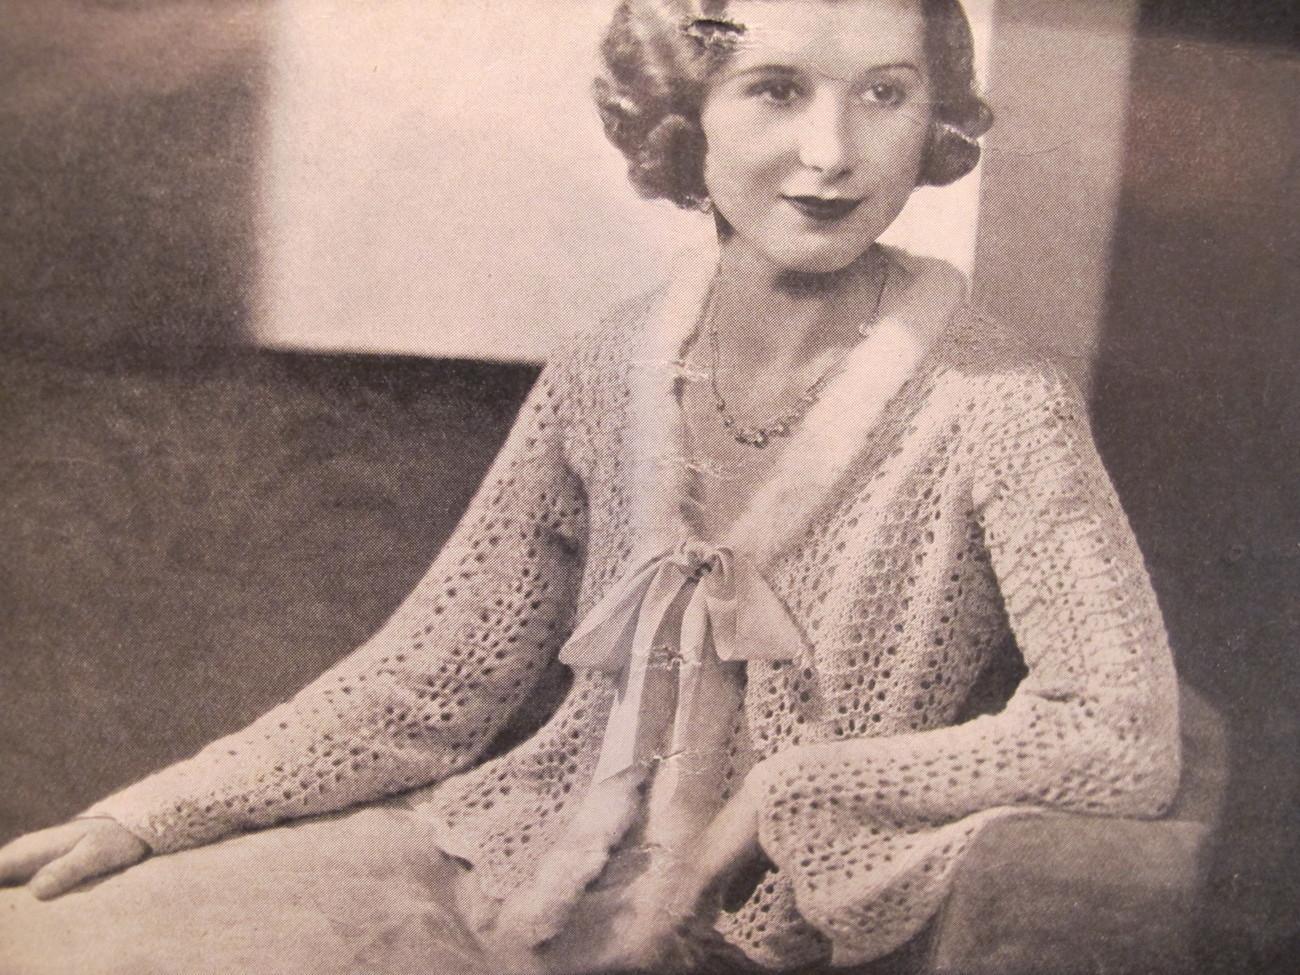 Vintage Knitting Crocheting Crochet Patterns Bed Jackets Night Cap ADULTS